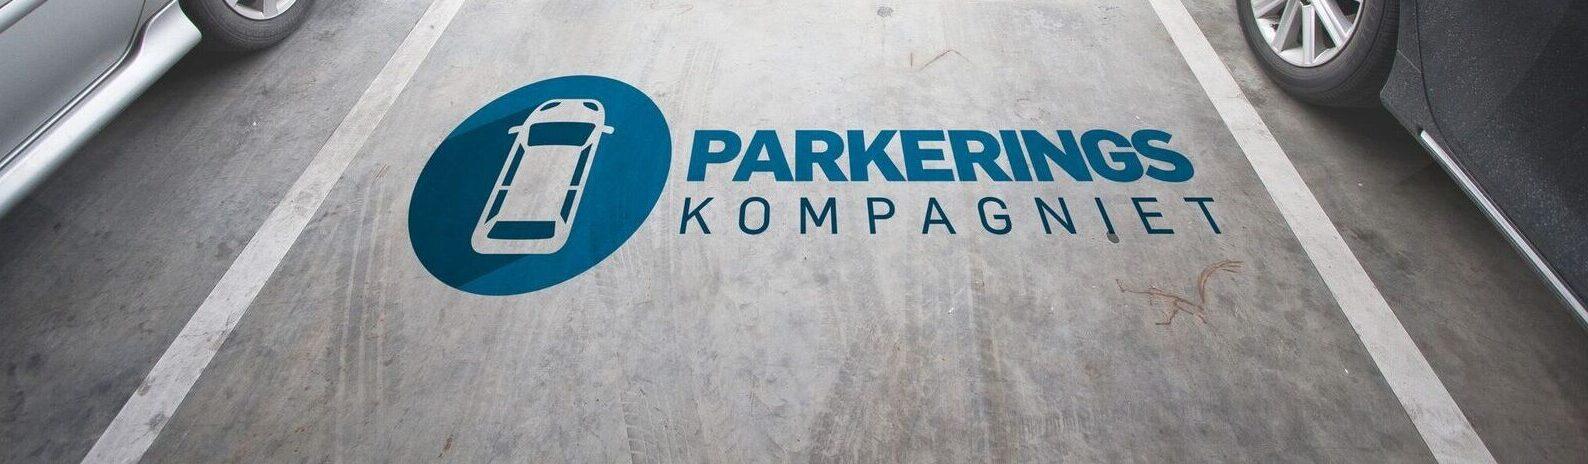 Om Parkeringskompagniet